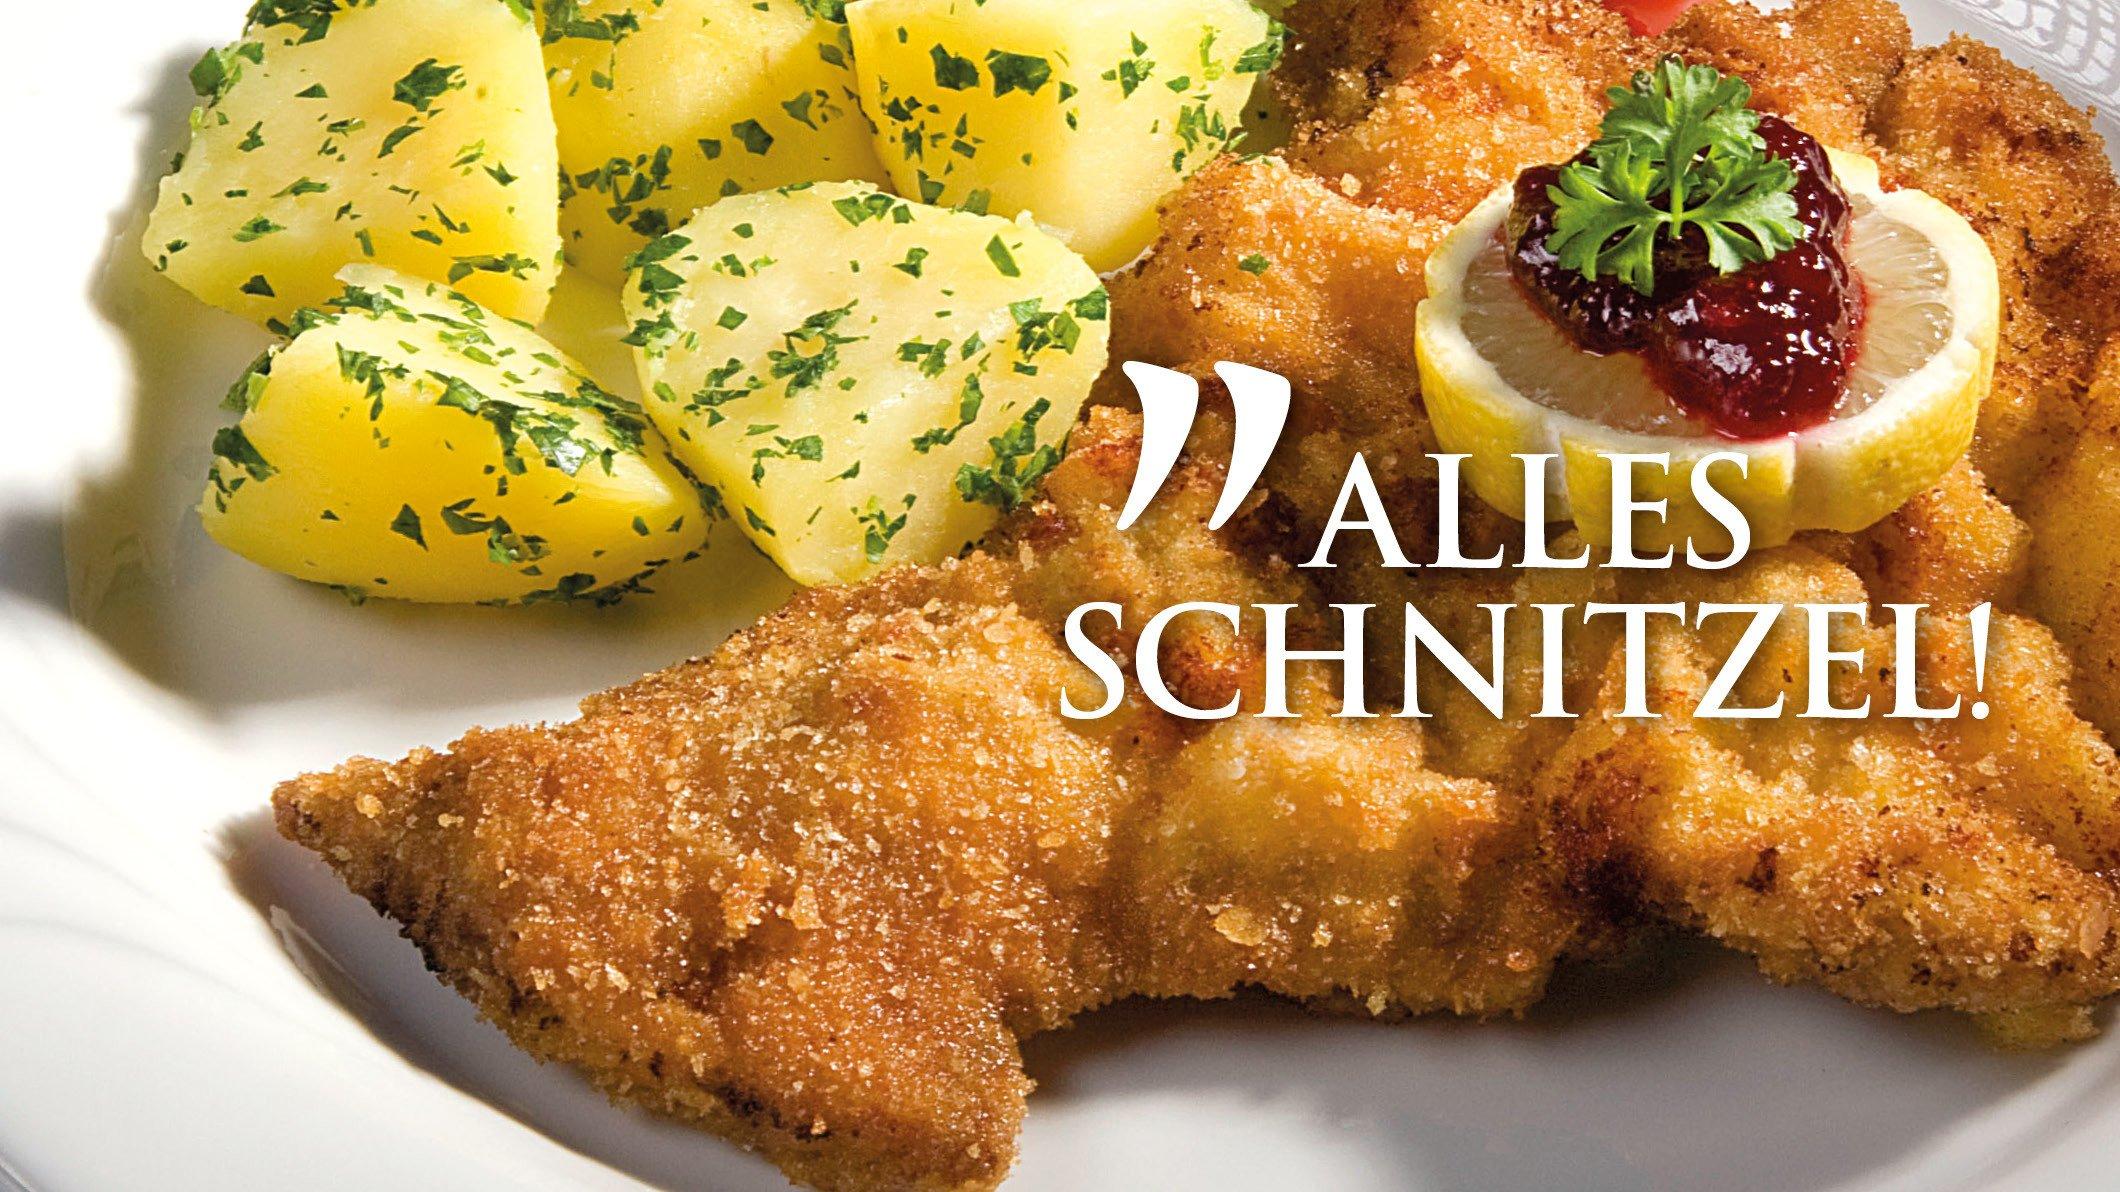 Schnitzel_sozialeMedien_2120x1192px